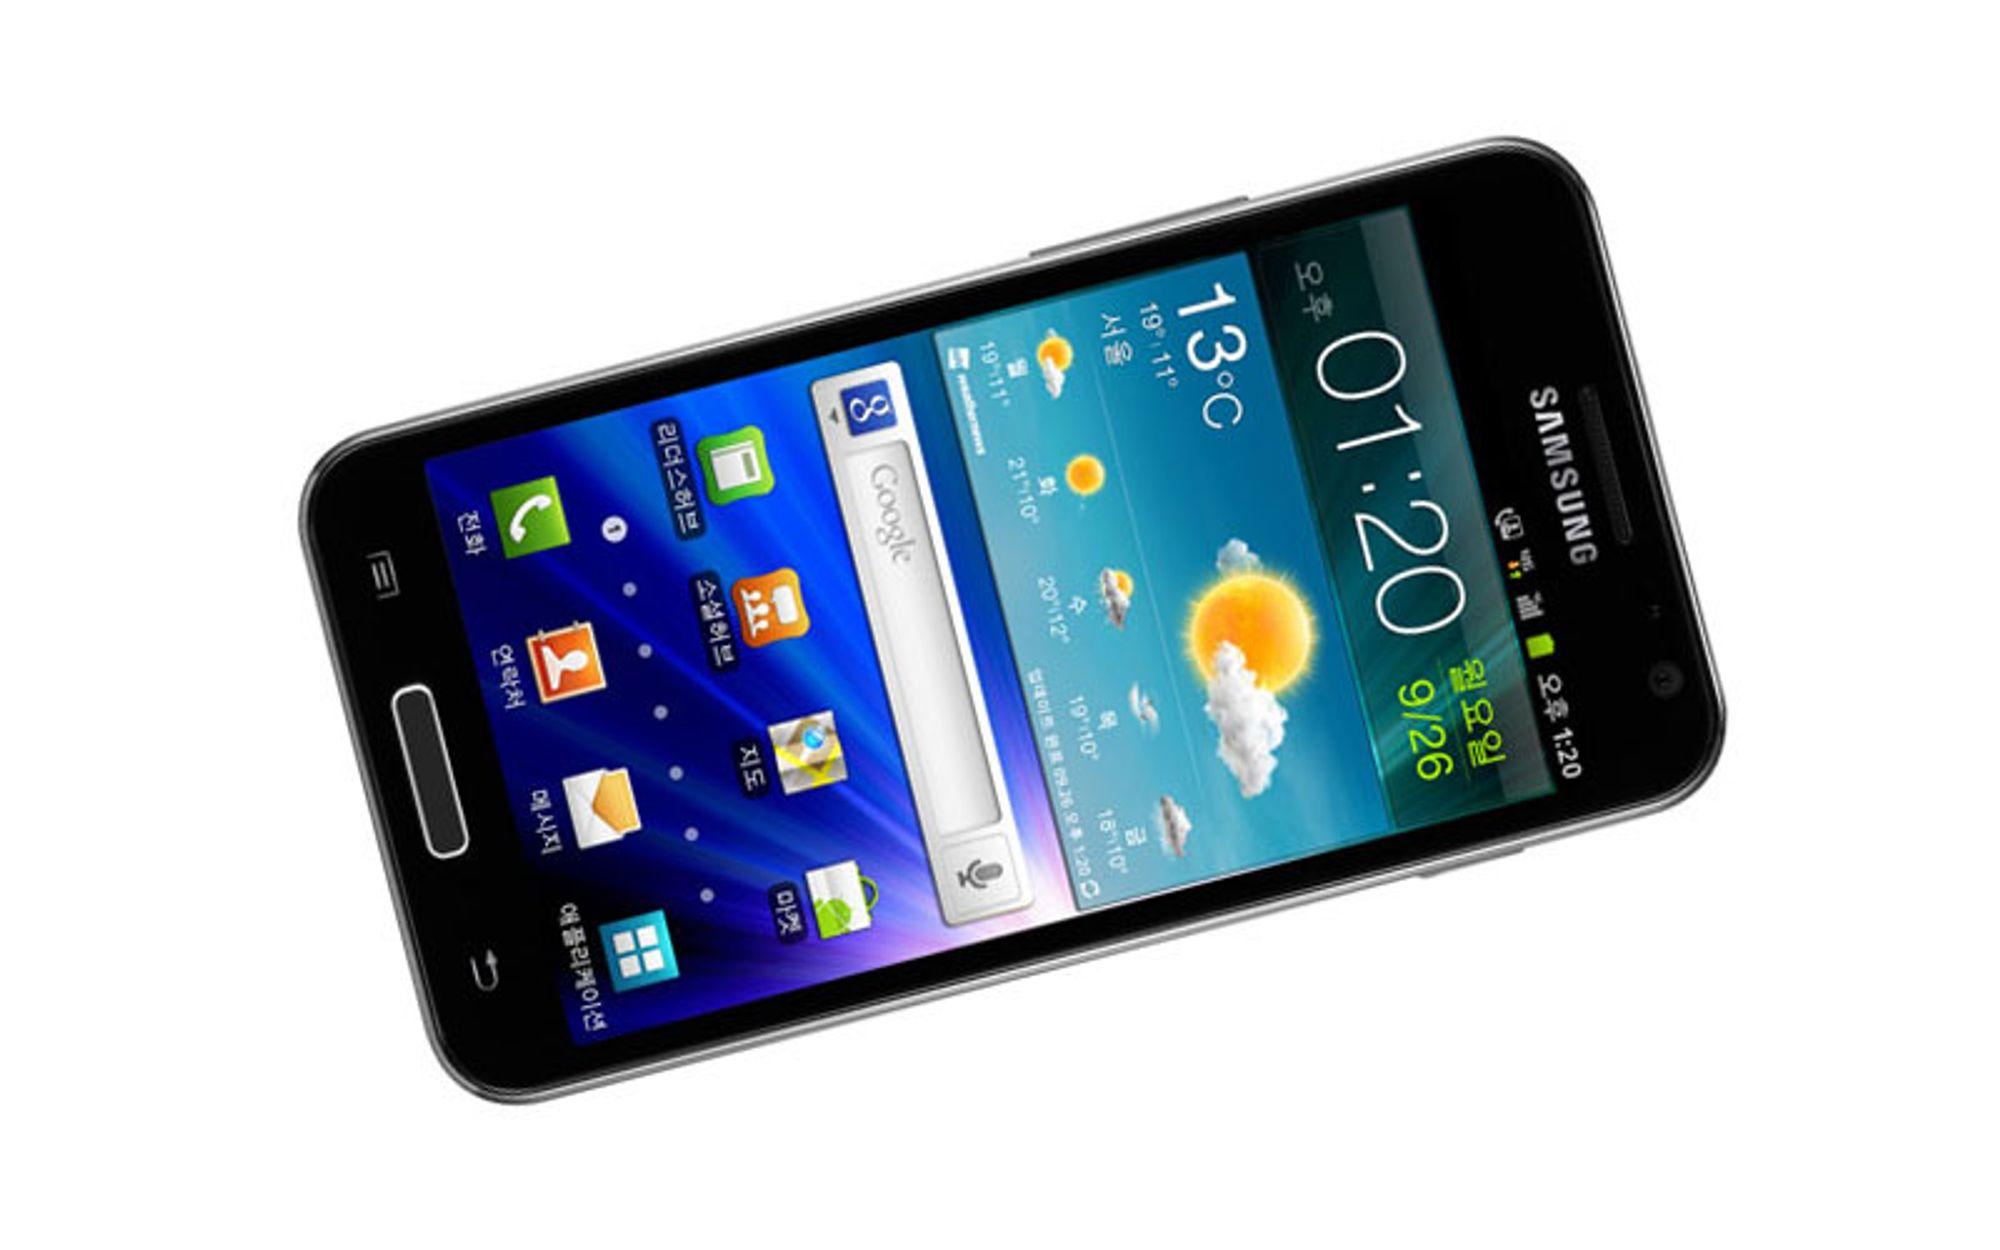 Her er Galaxy S II med HD-skjerm